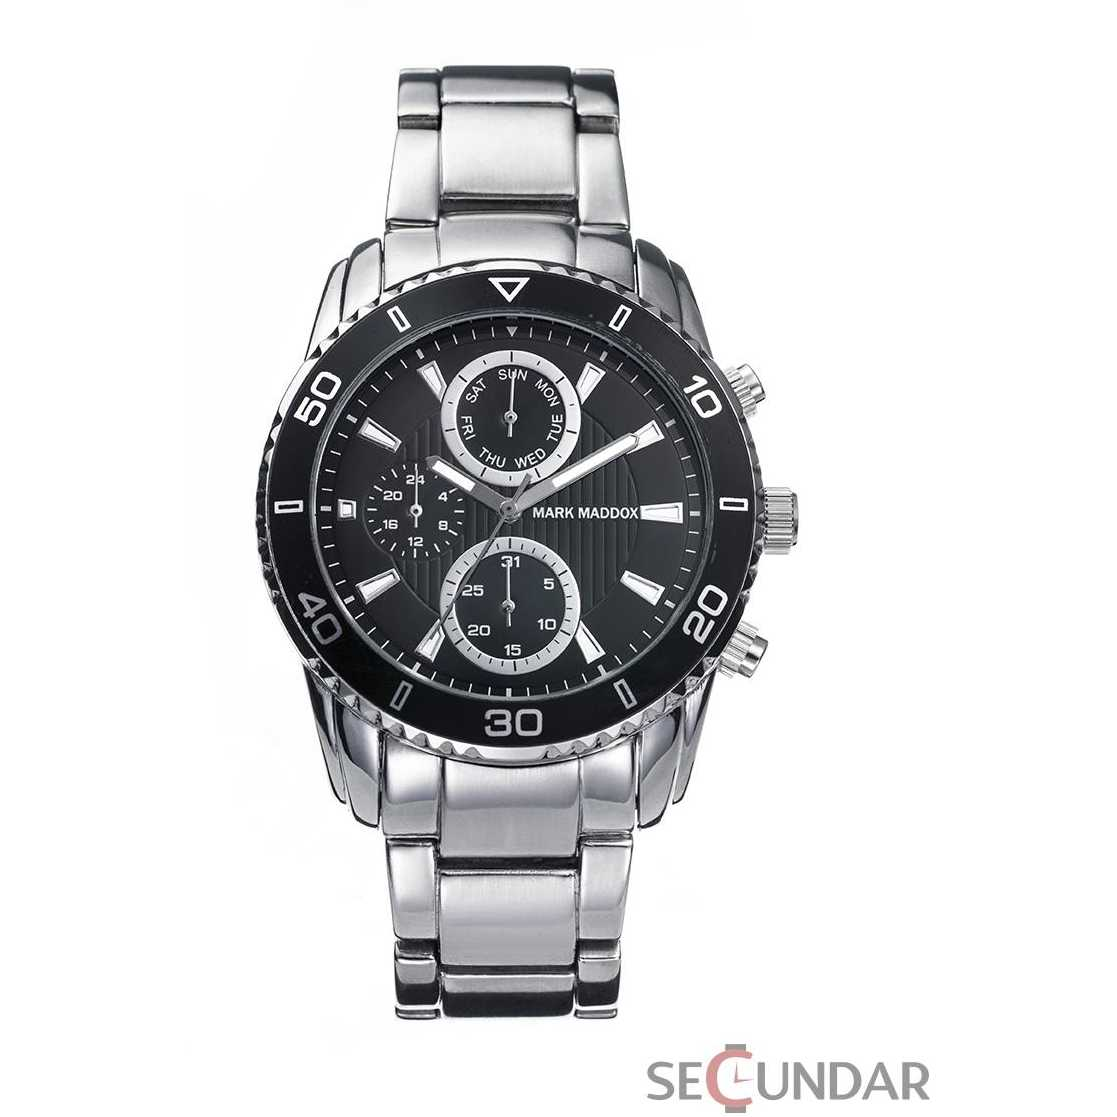 Ceas Mark Maddox TIMELESS LUXURY HM6005-57 Black Chronograph Barbatesc